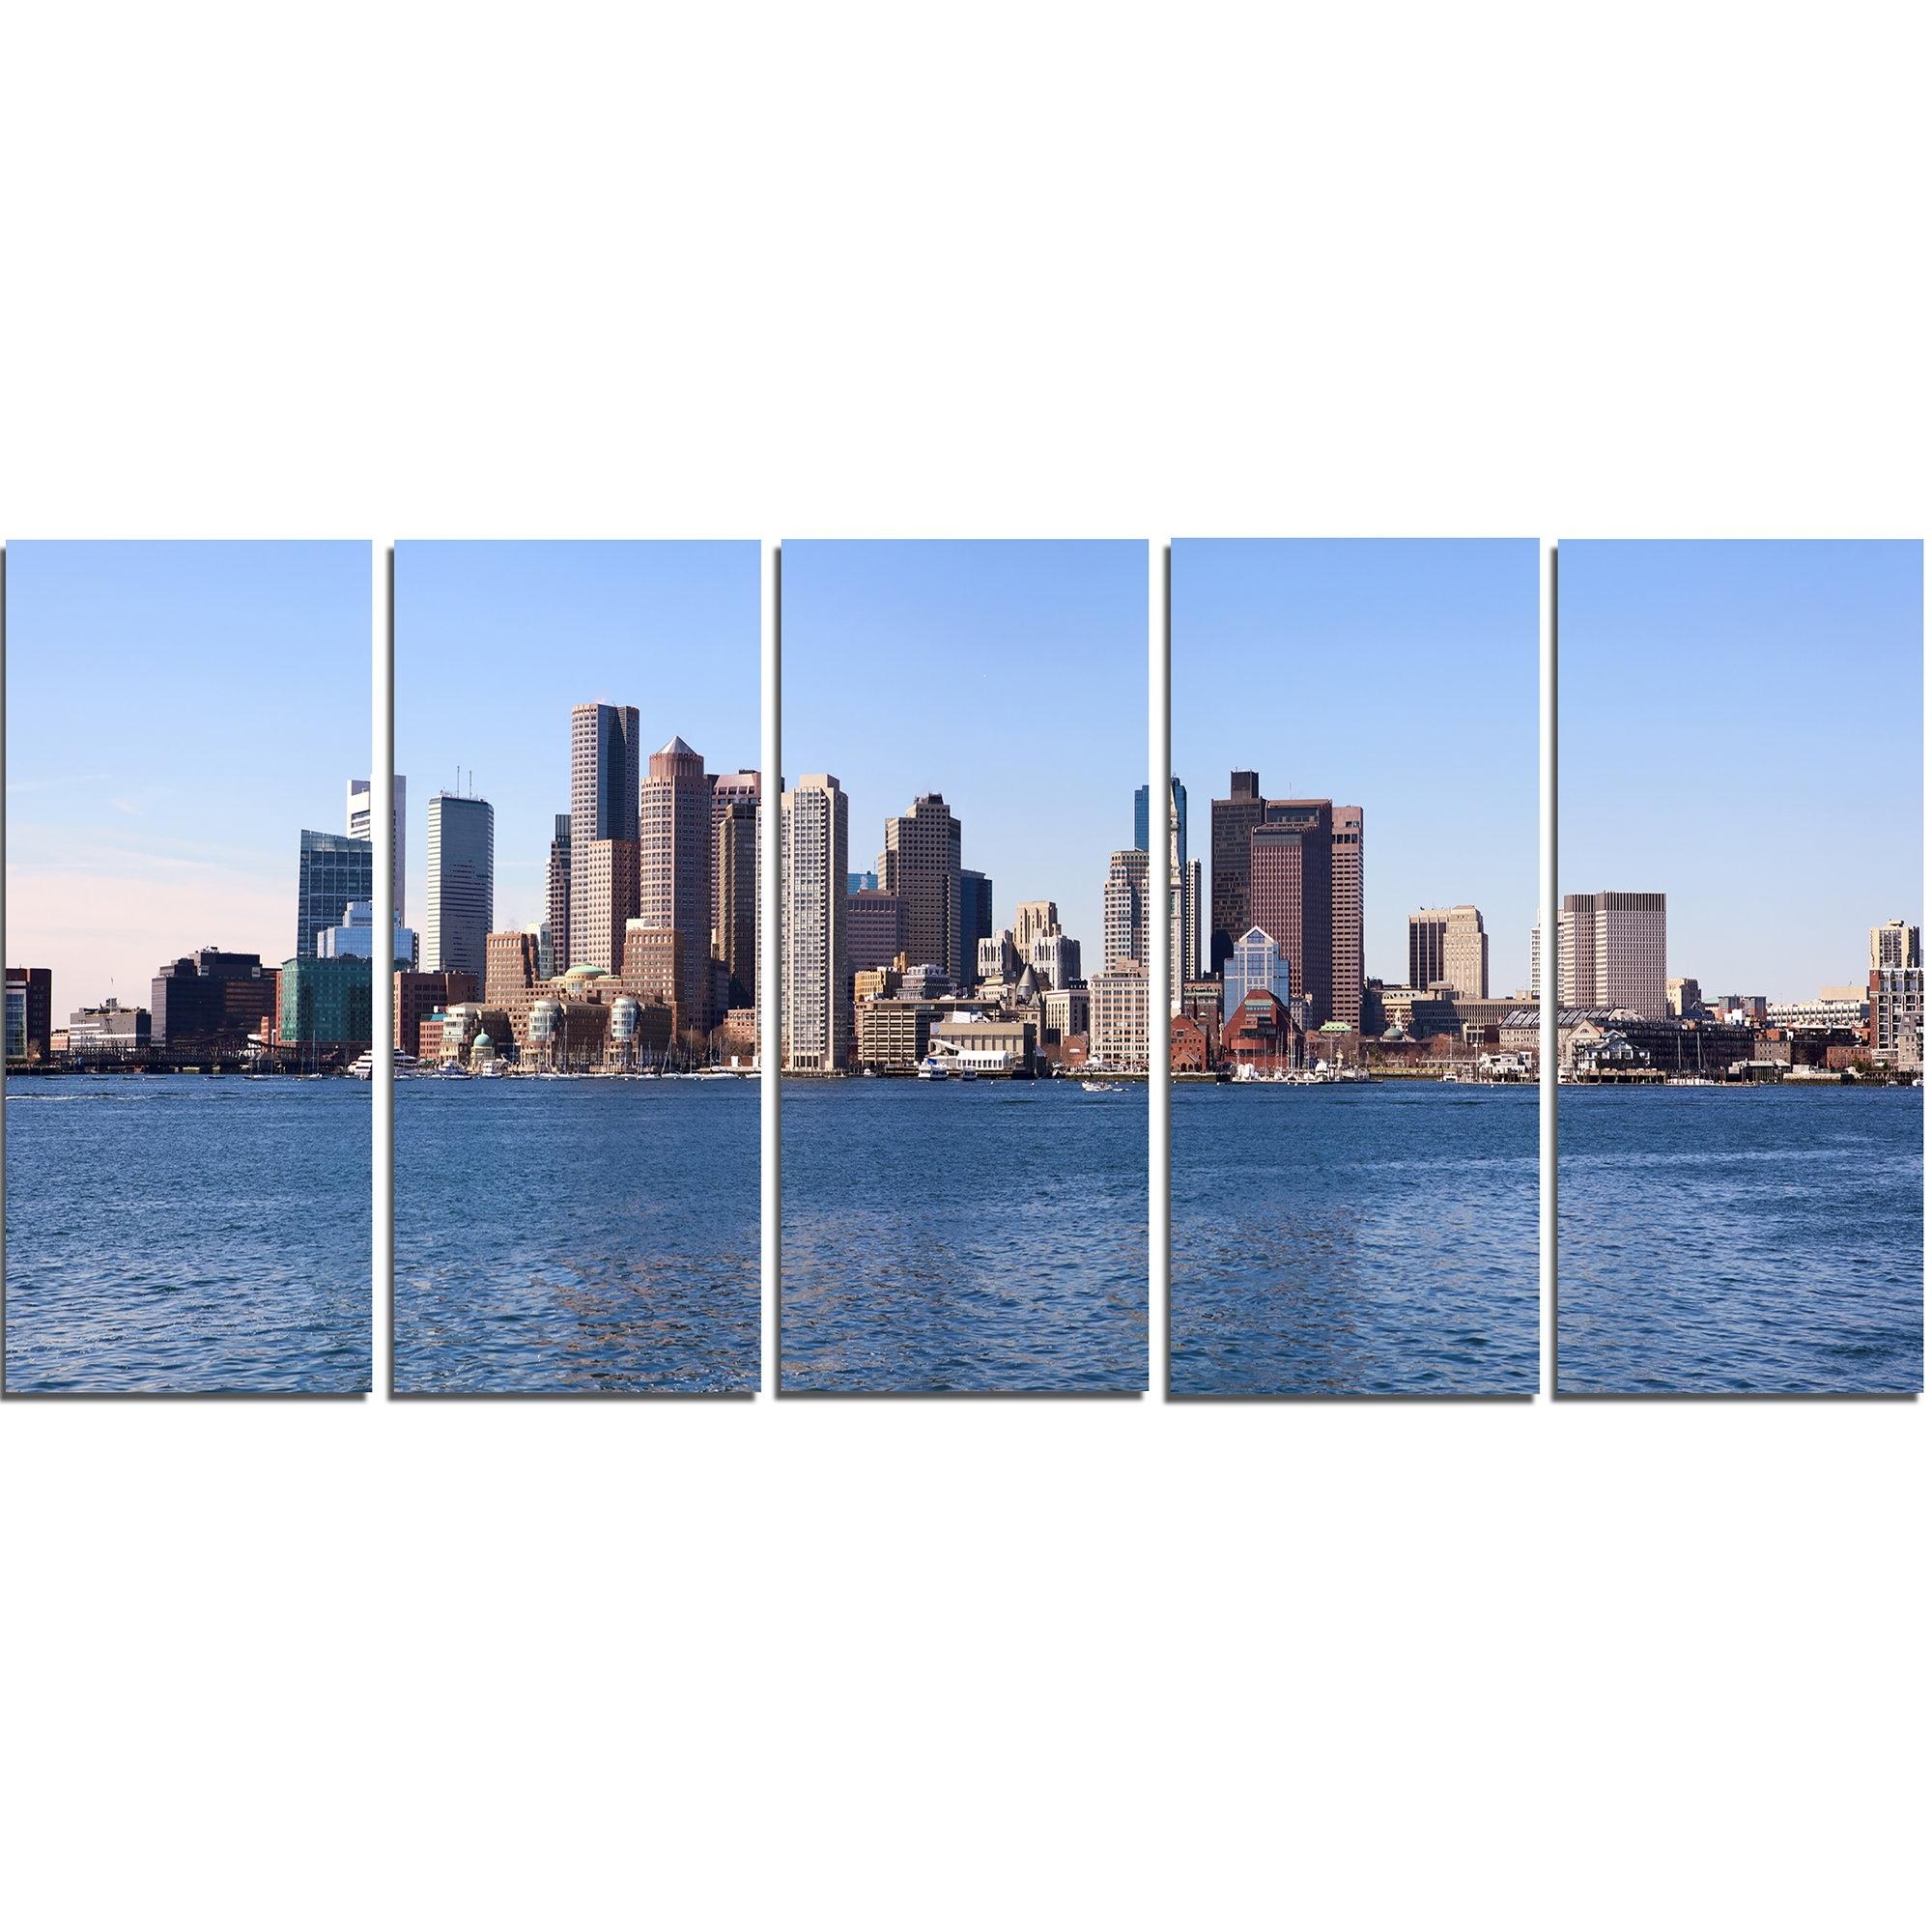 Designart Boston Skyline Panorama 5 Piece Wall Art On Wrapped Canvas Within Boston Wall Art (View 10 of 20)